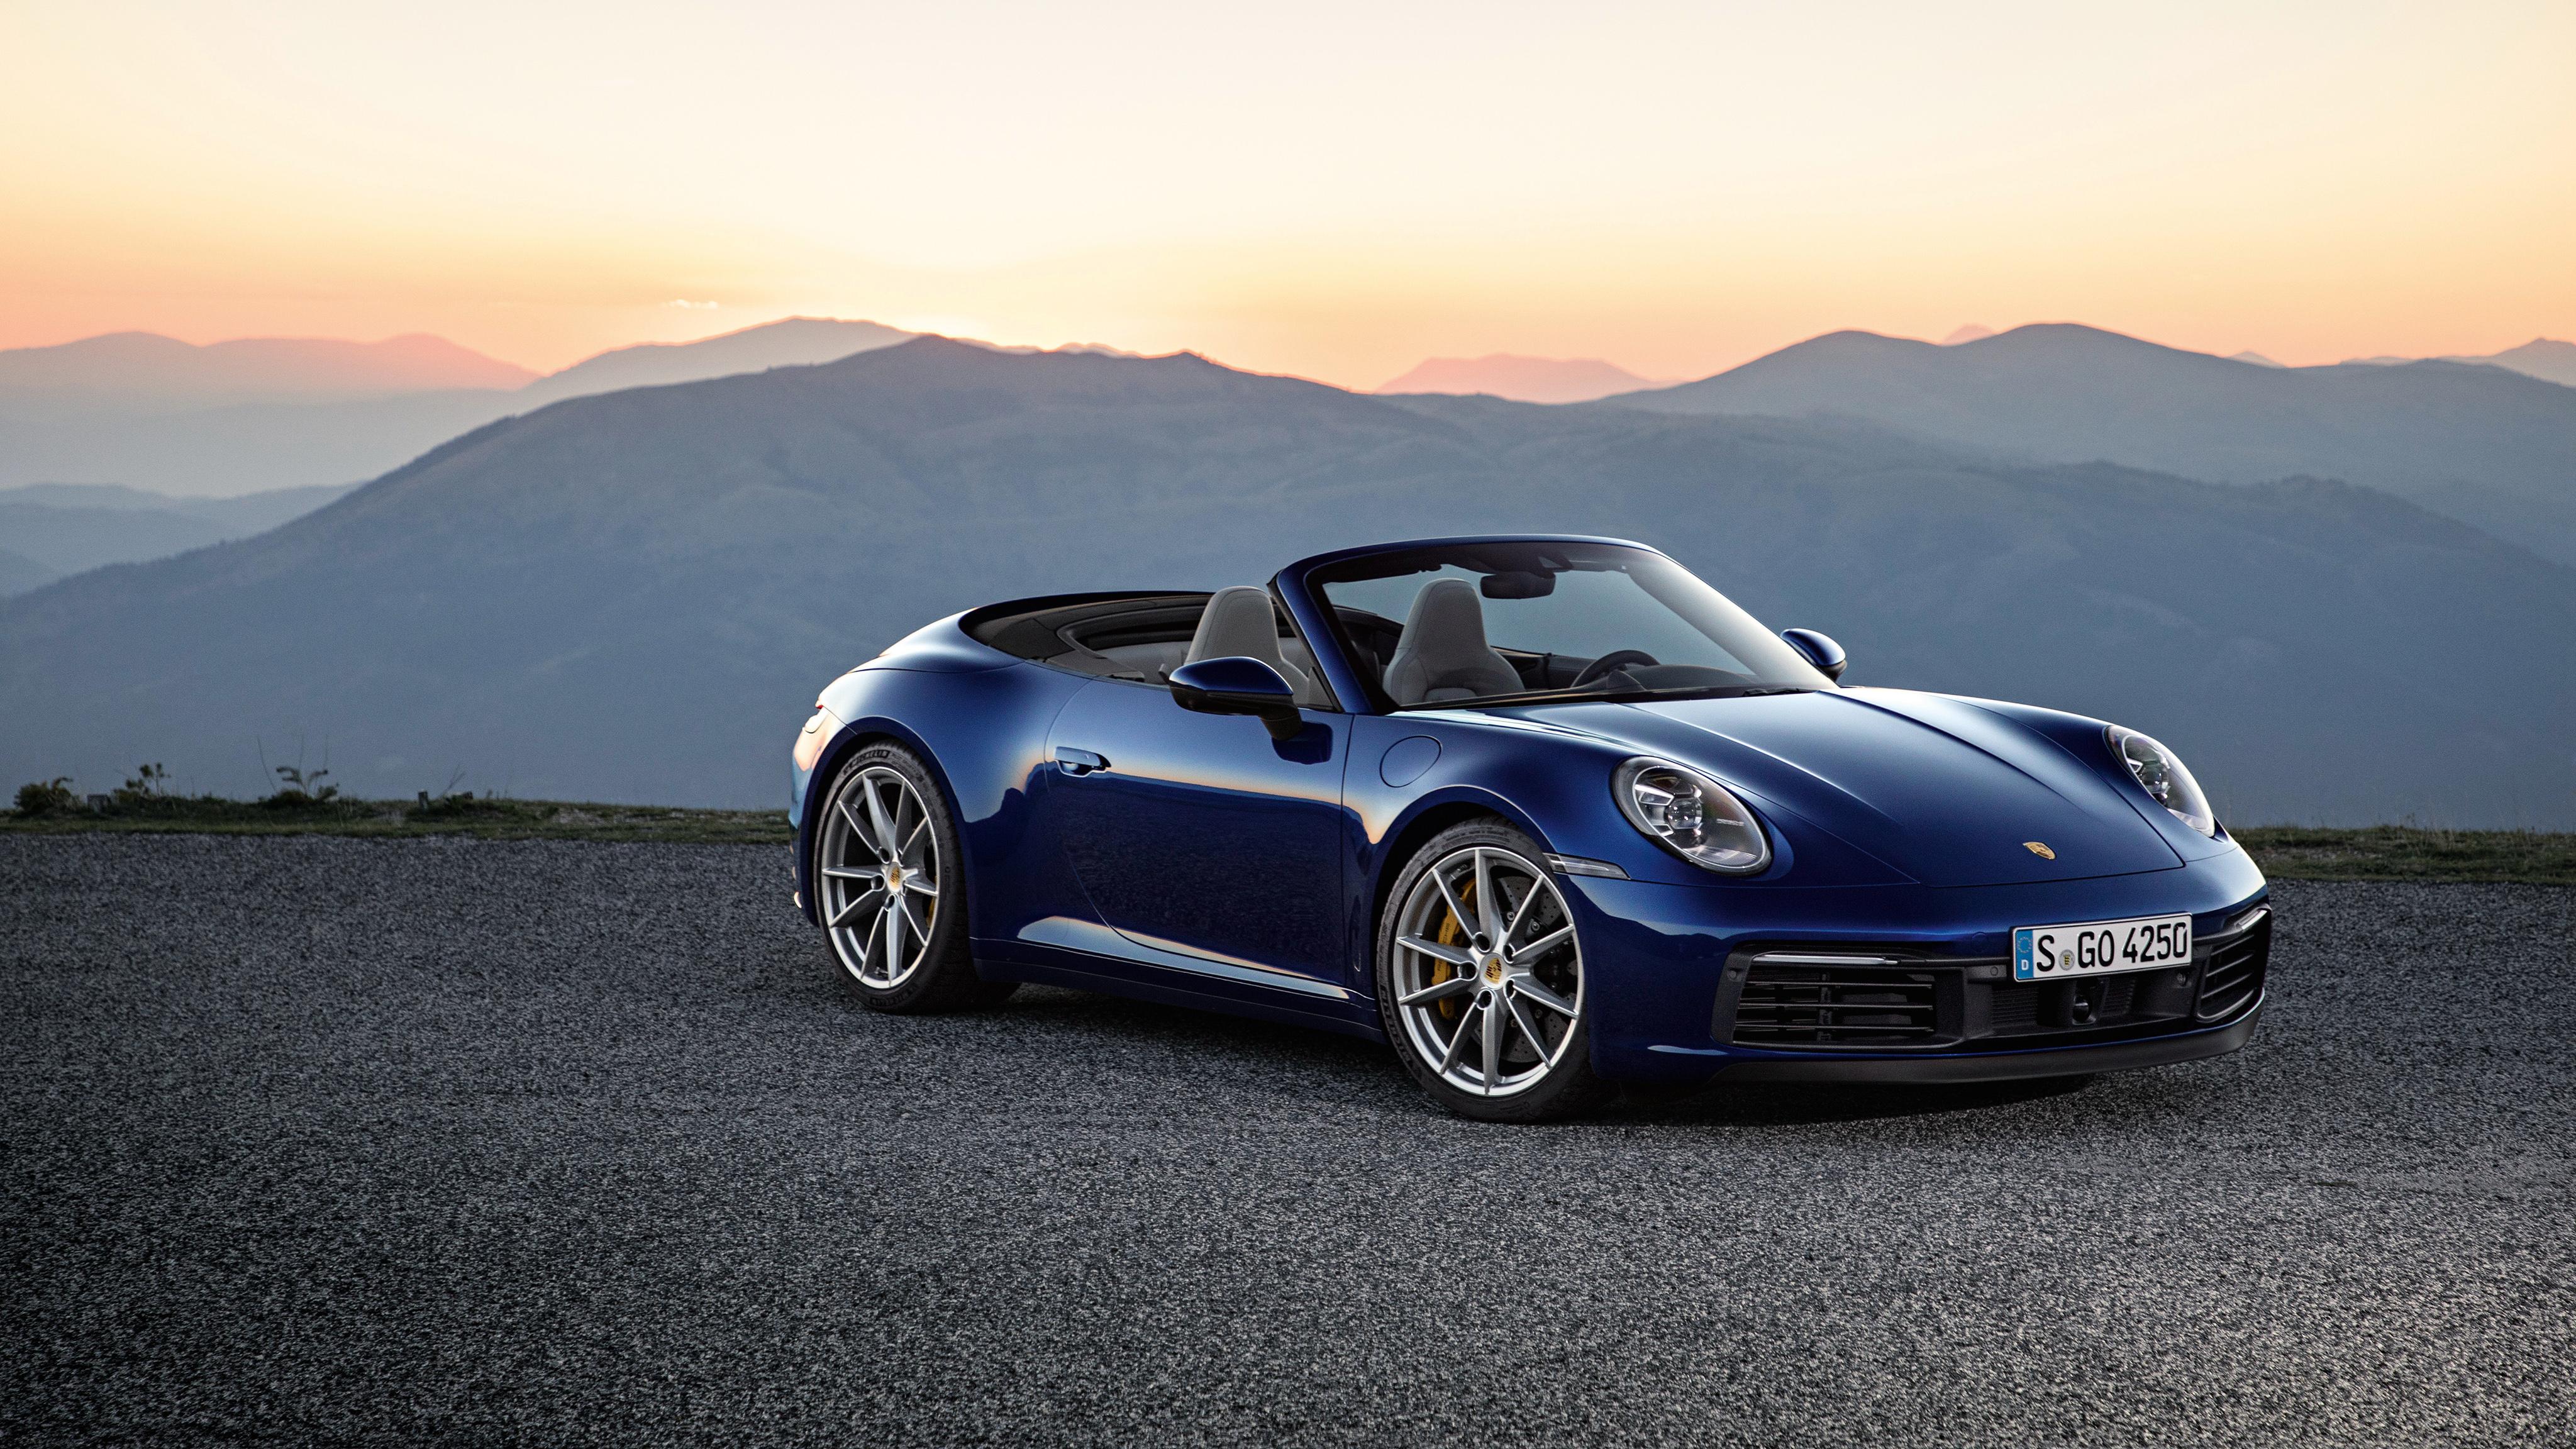 Porsche 911 carrera 4s cabriolet 2019 4k wallpaper hd - Porsche 911 carrera s wallpaper ...